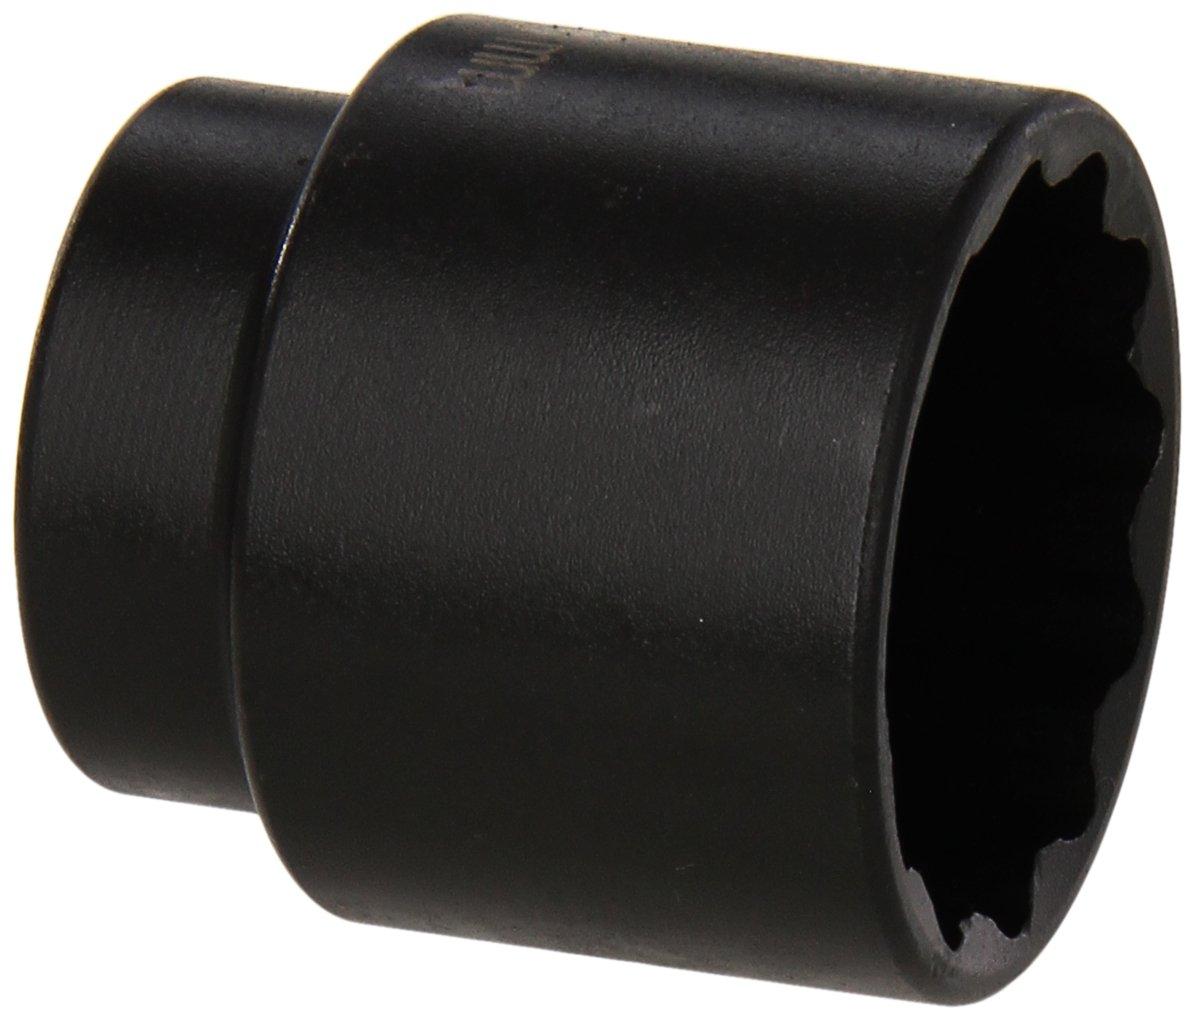 "Grey Pneumatic (2136M) 1/2"" Drive x 36mm Standard 12-Point Socket"